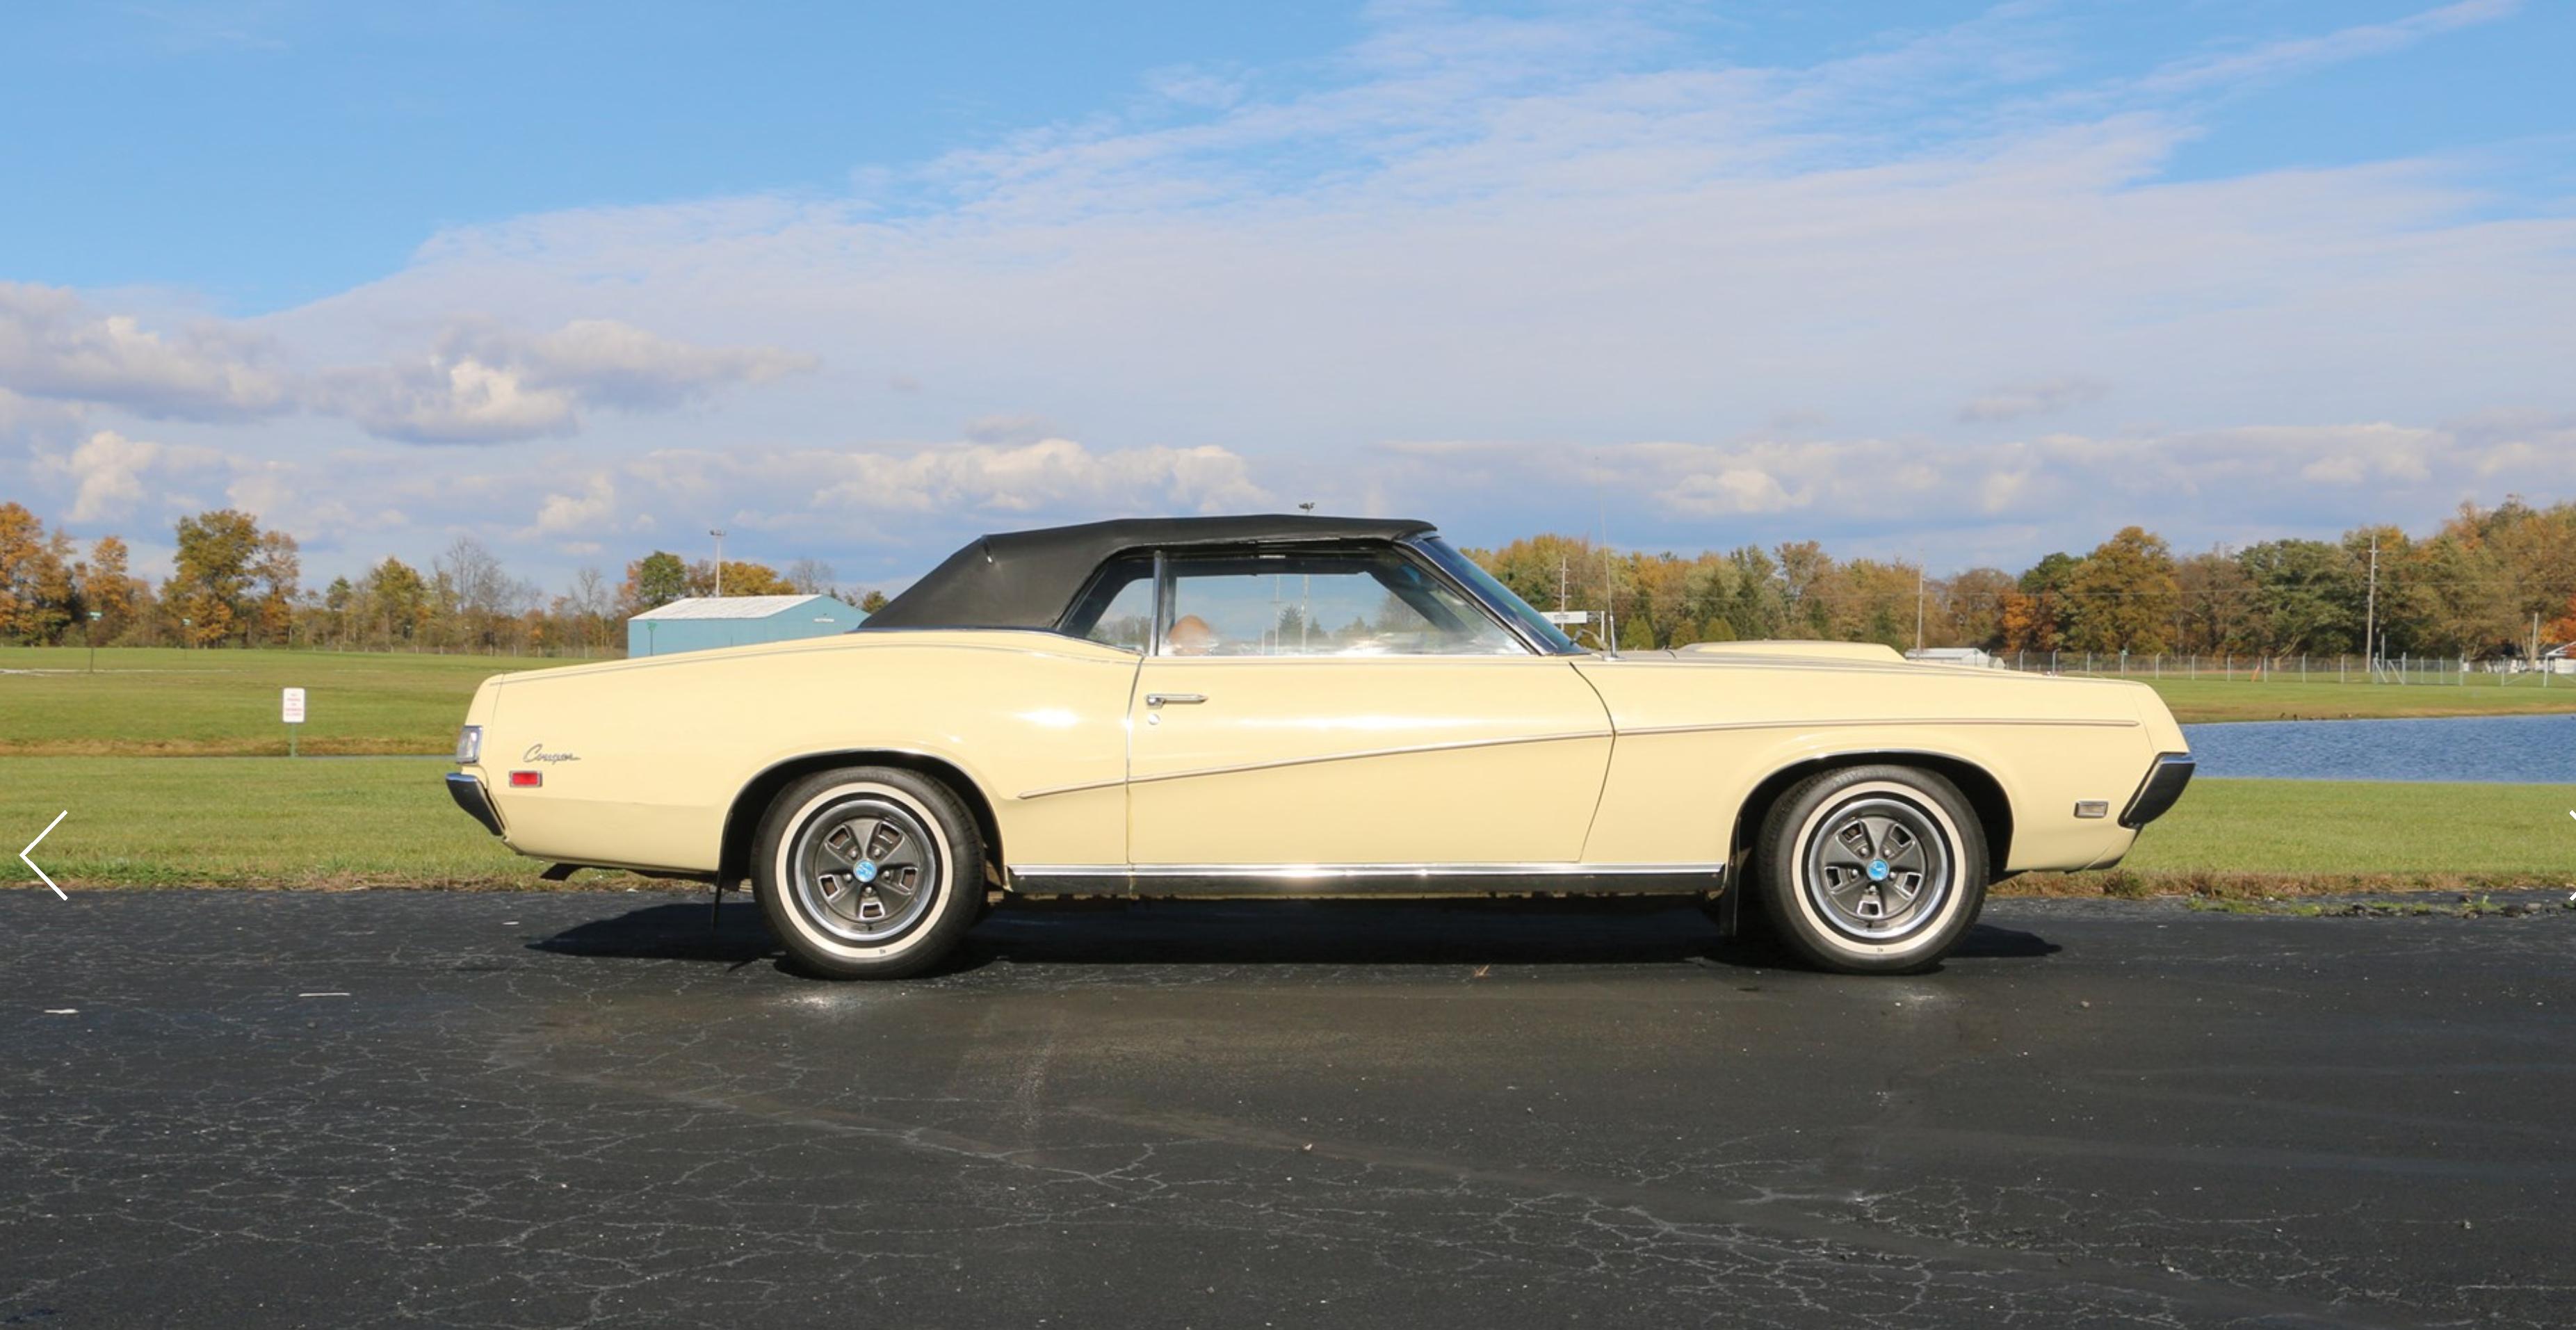 1969 Mercury Cougar CJ428 Convertible Muscle cars